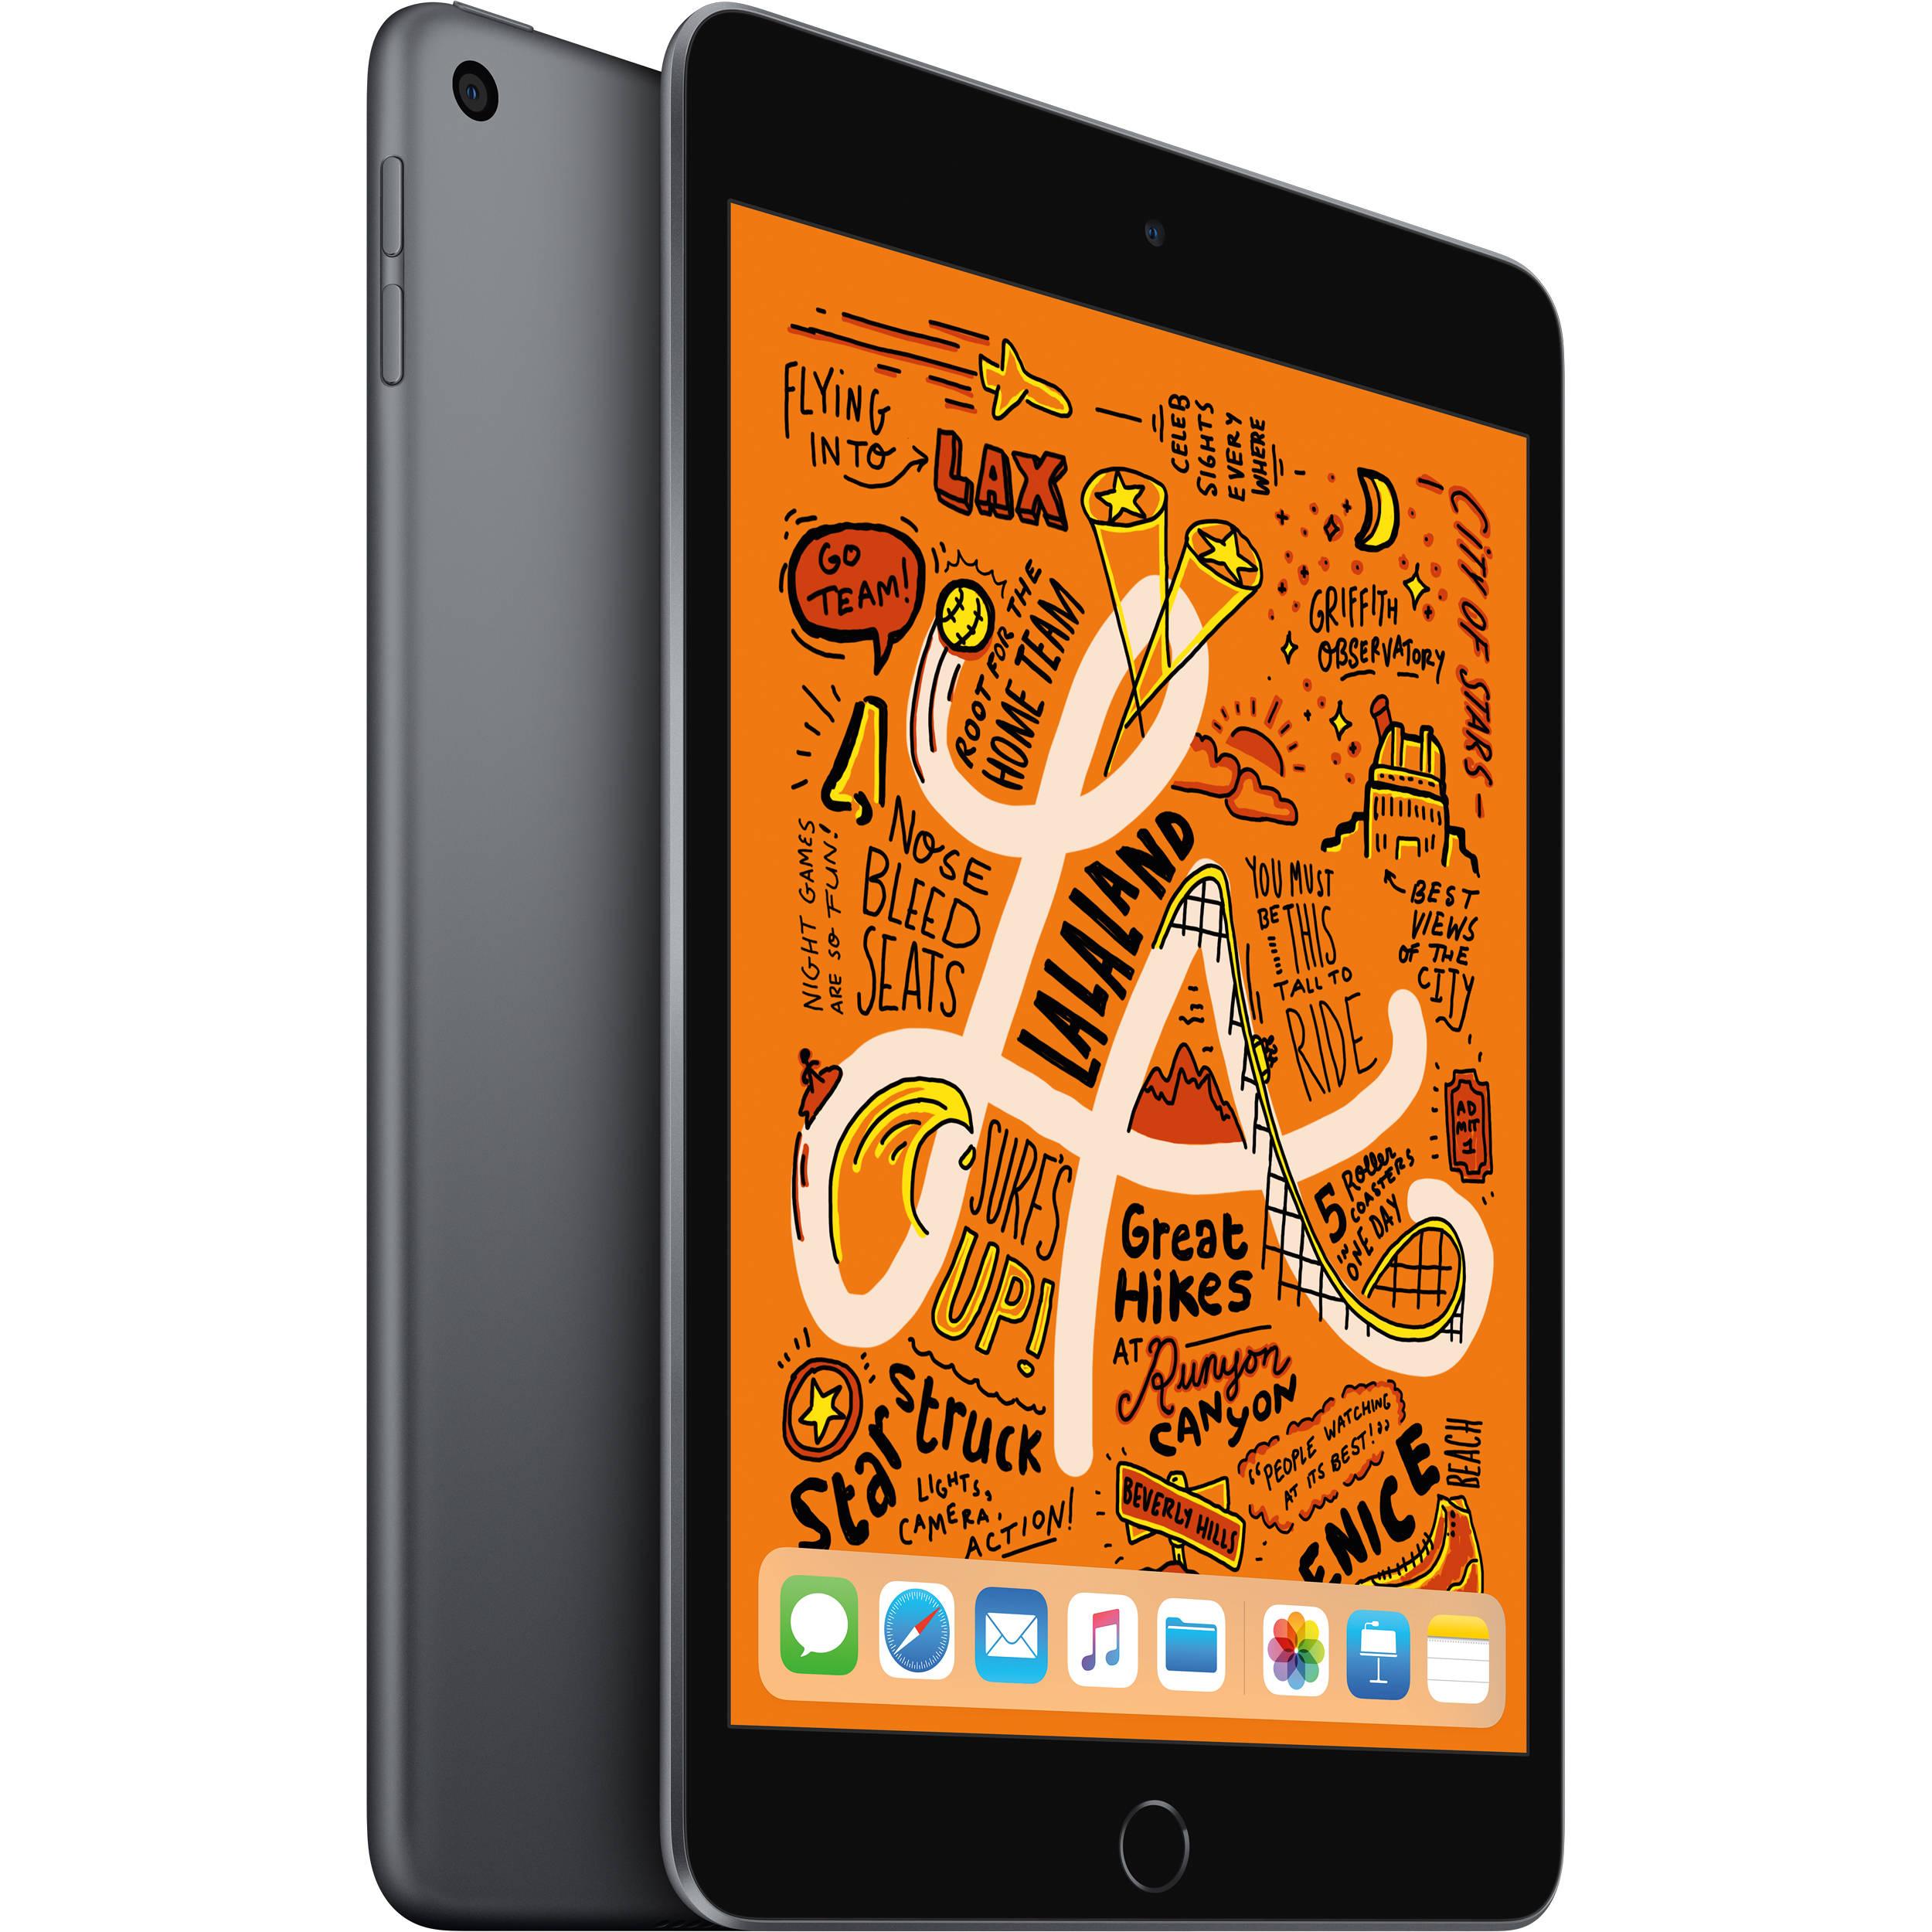 Central iPad ipad mini discount offer